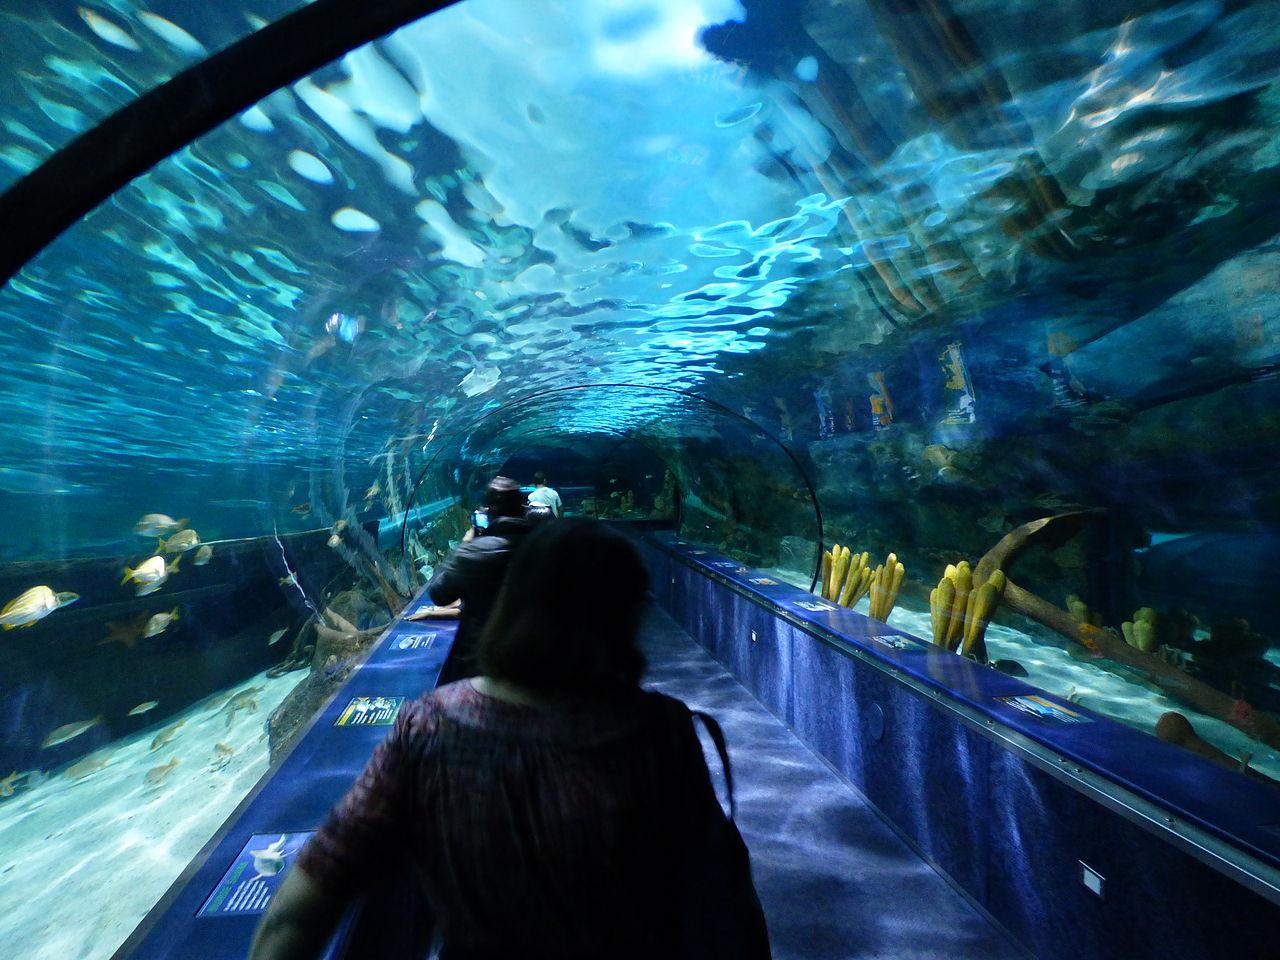 File:Shark Cave Ripley's Aquarium Myrtle Beach.JPG ...